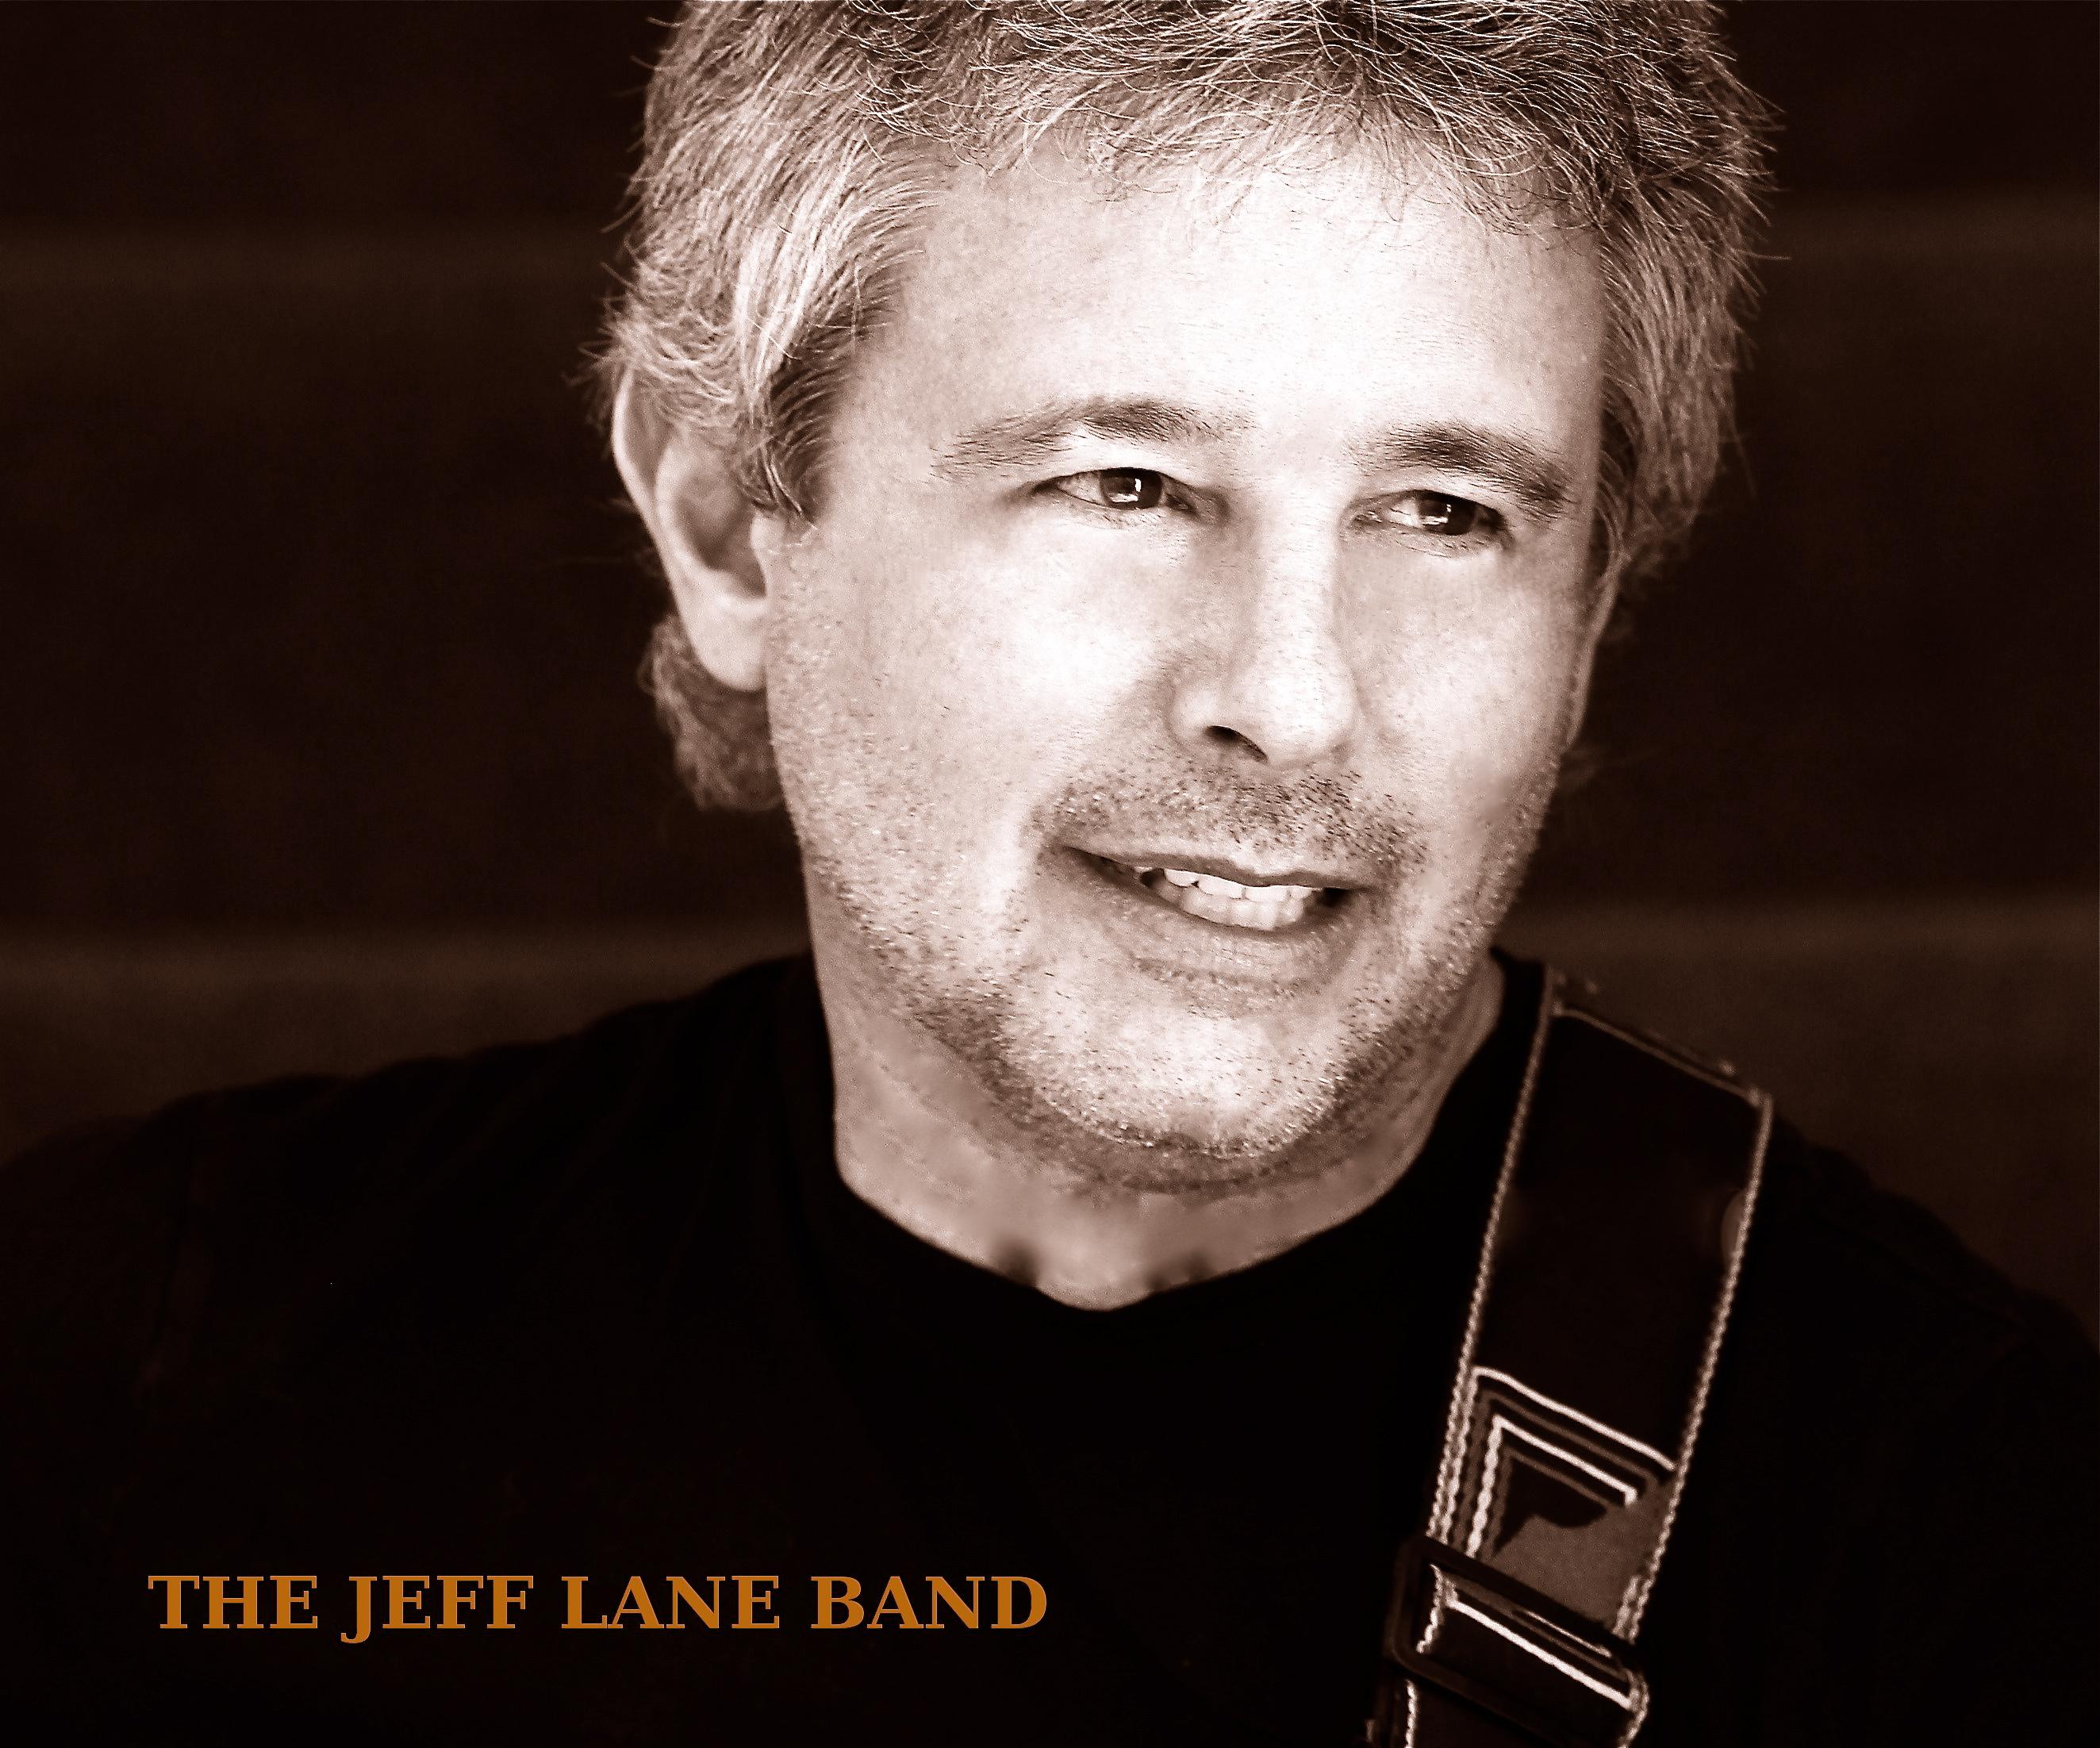 Jeff Lane Photo